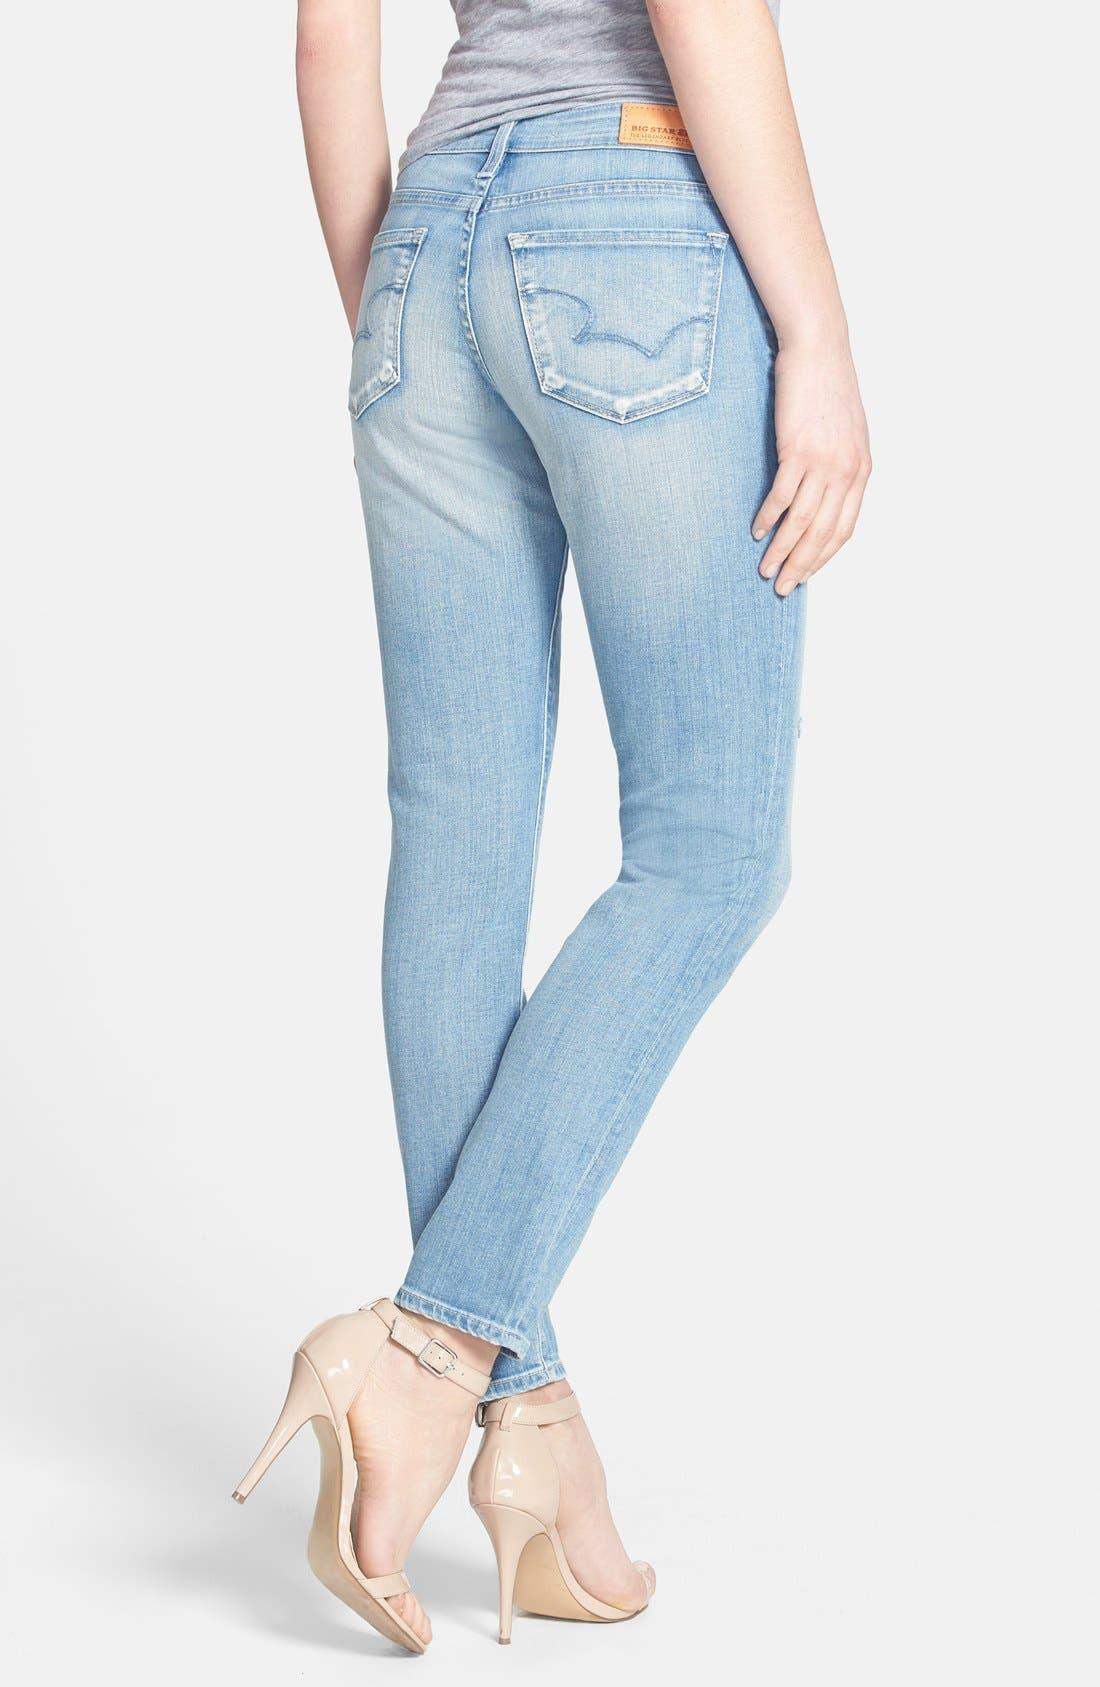 Alternate Image 2  - Big Star 'Alex' Distressed Stretch Skinny Jeans (20-Year Harbor) (Petite)